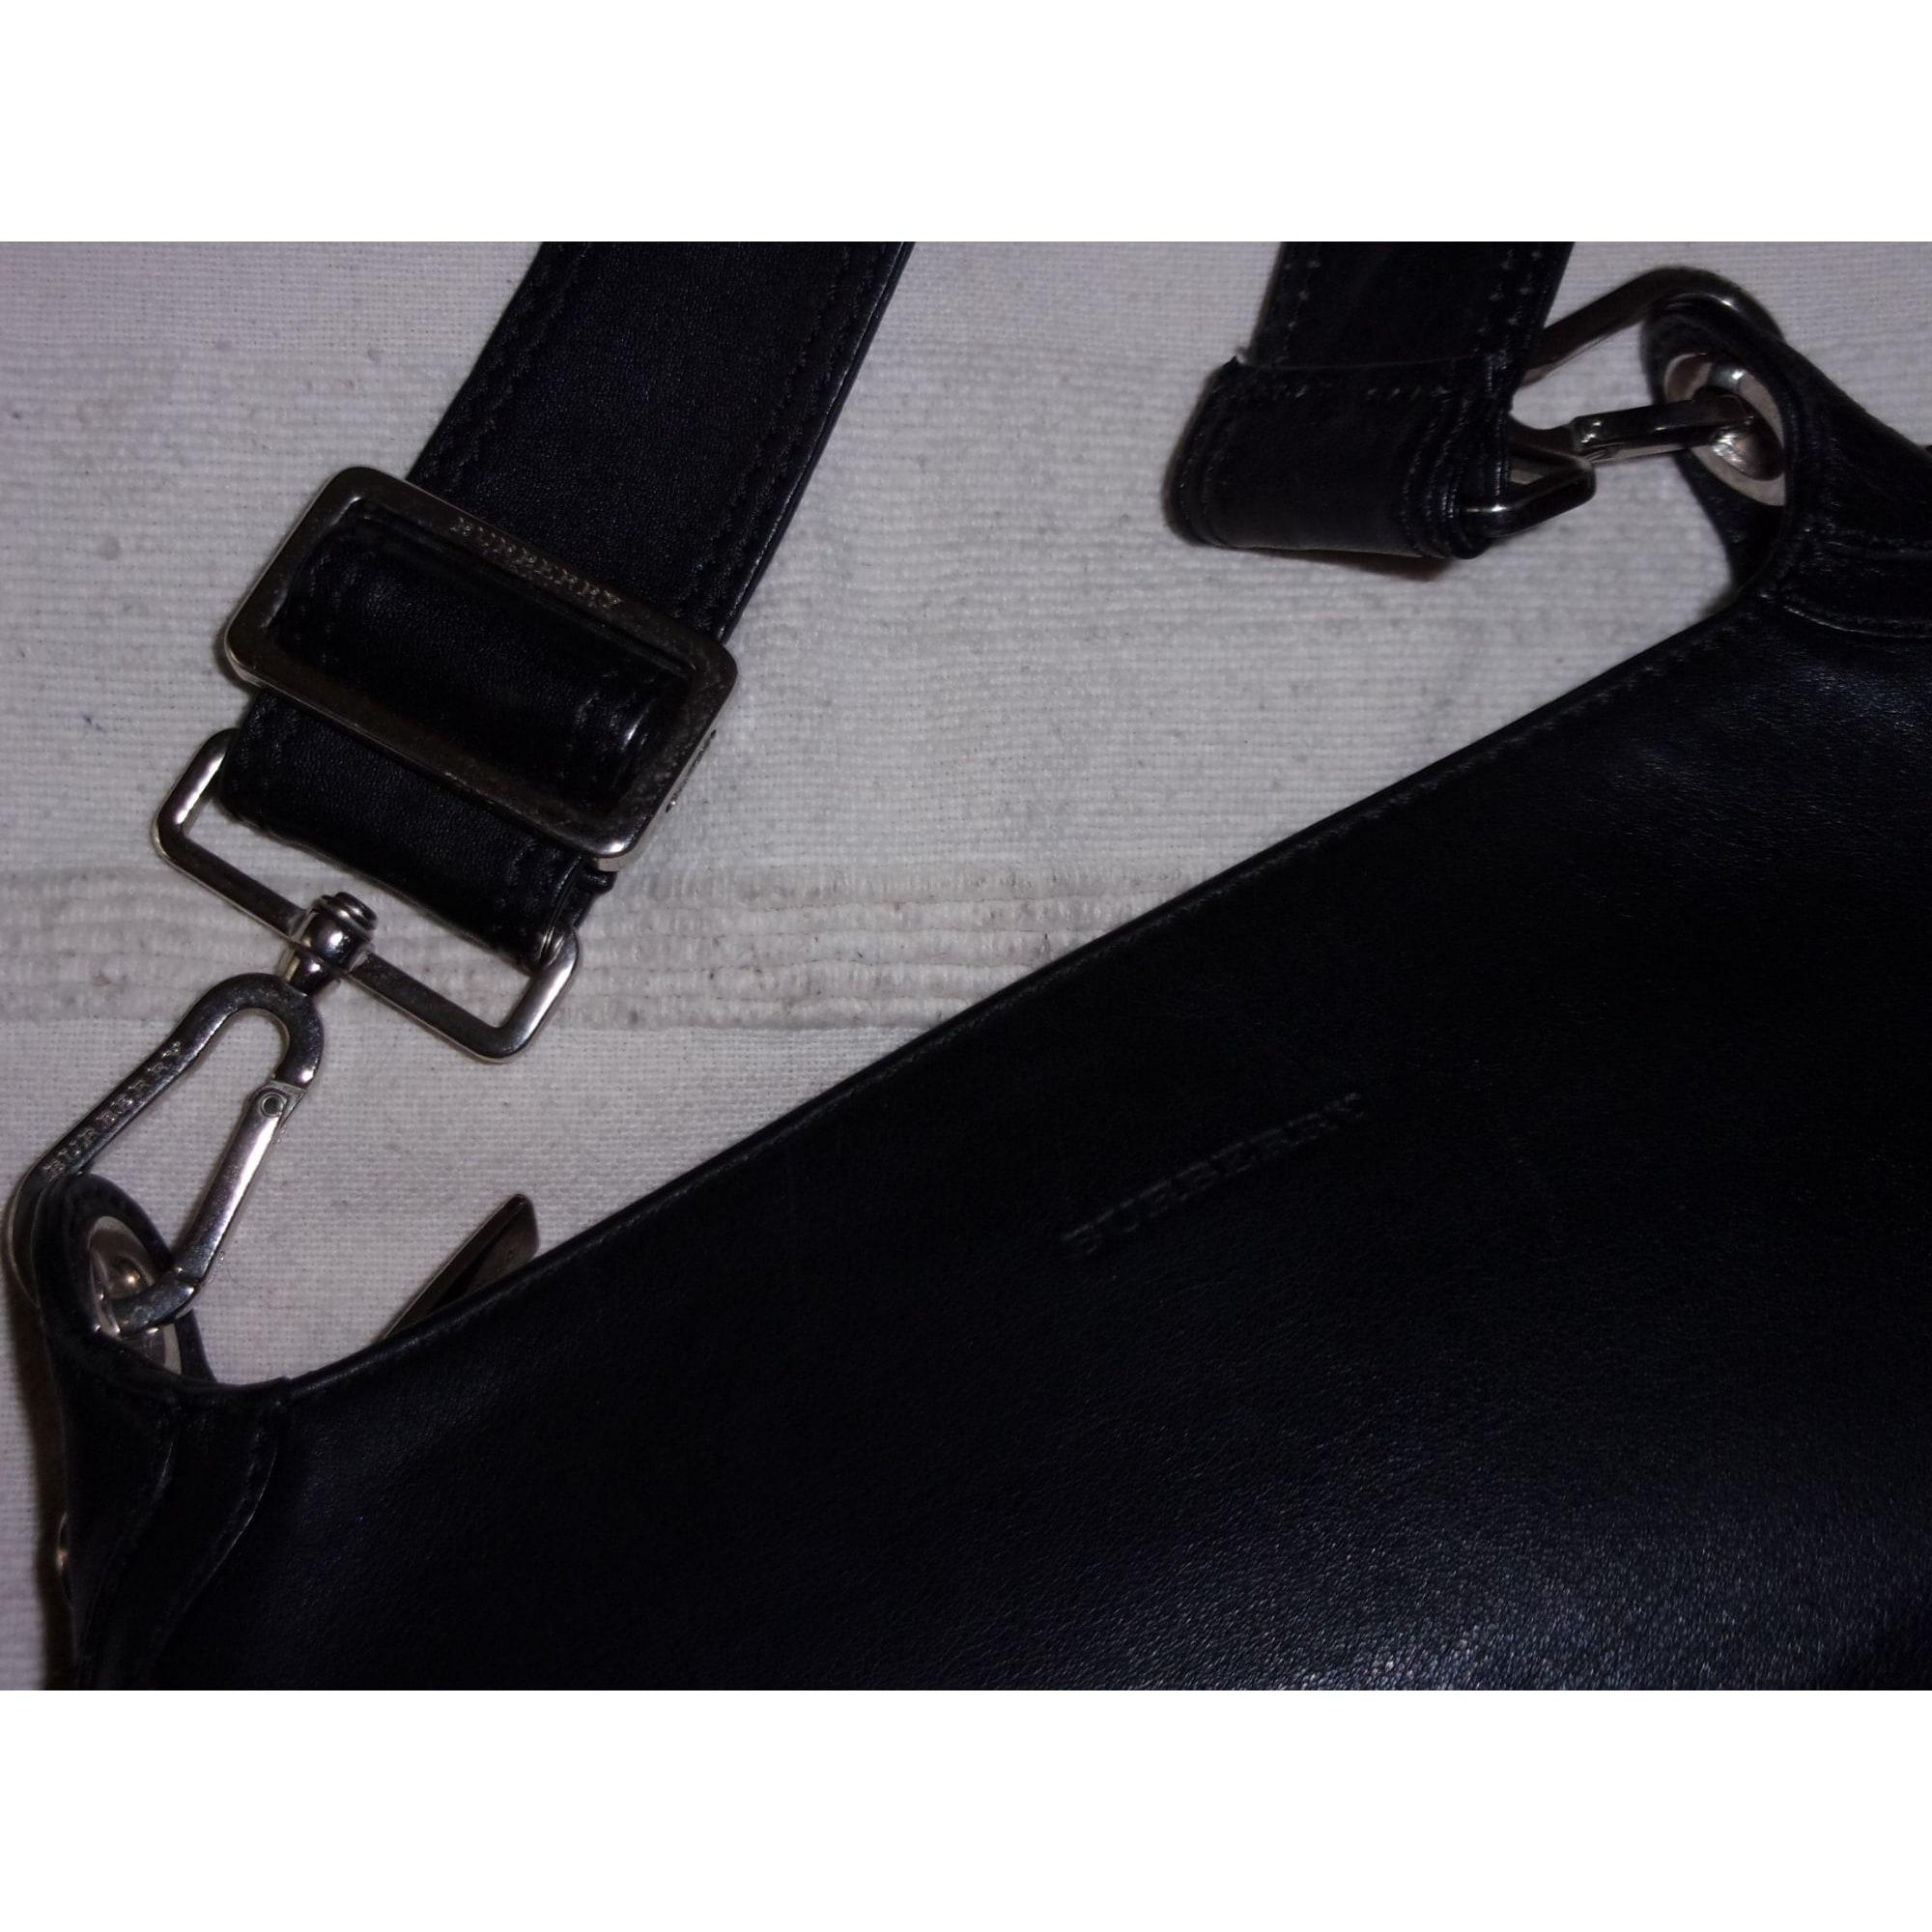 Sac à main en cuir cuir noir Burberry en coloris Noir 2Pq2